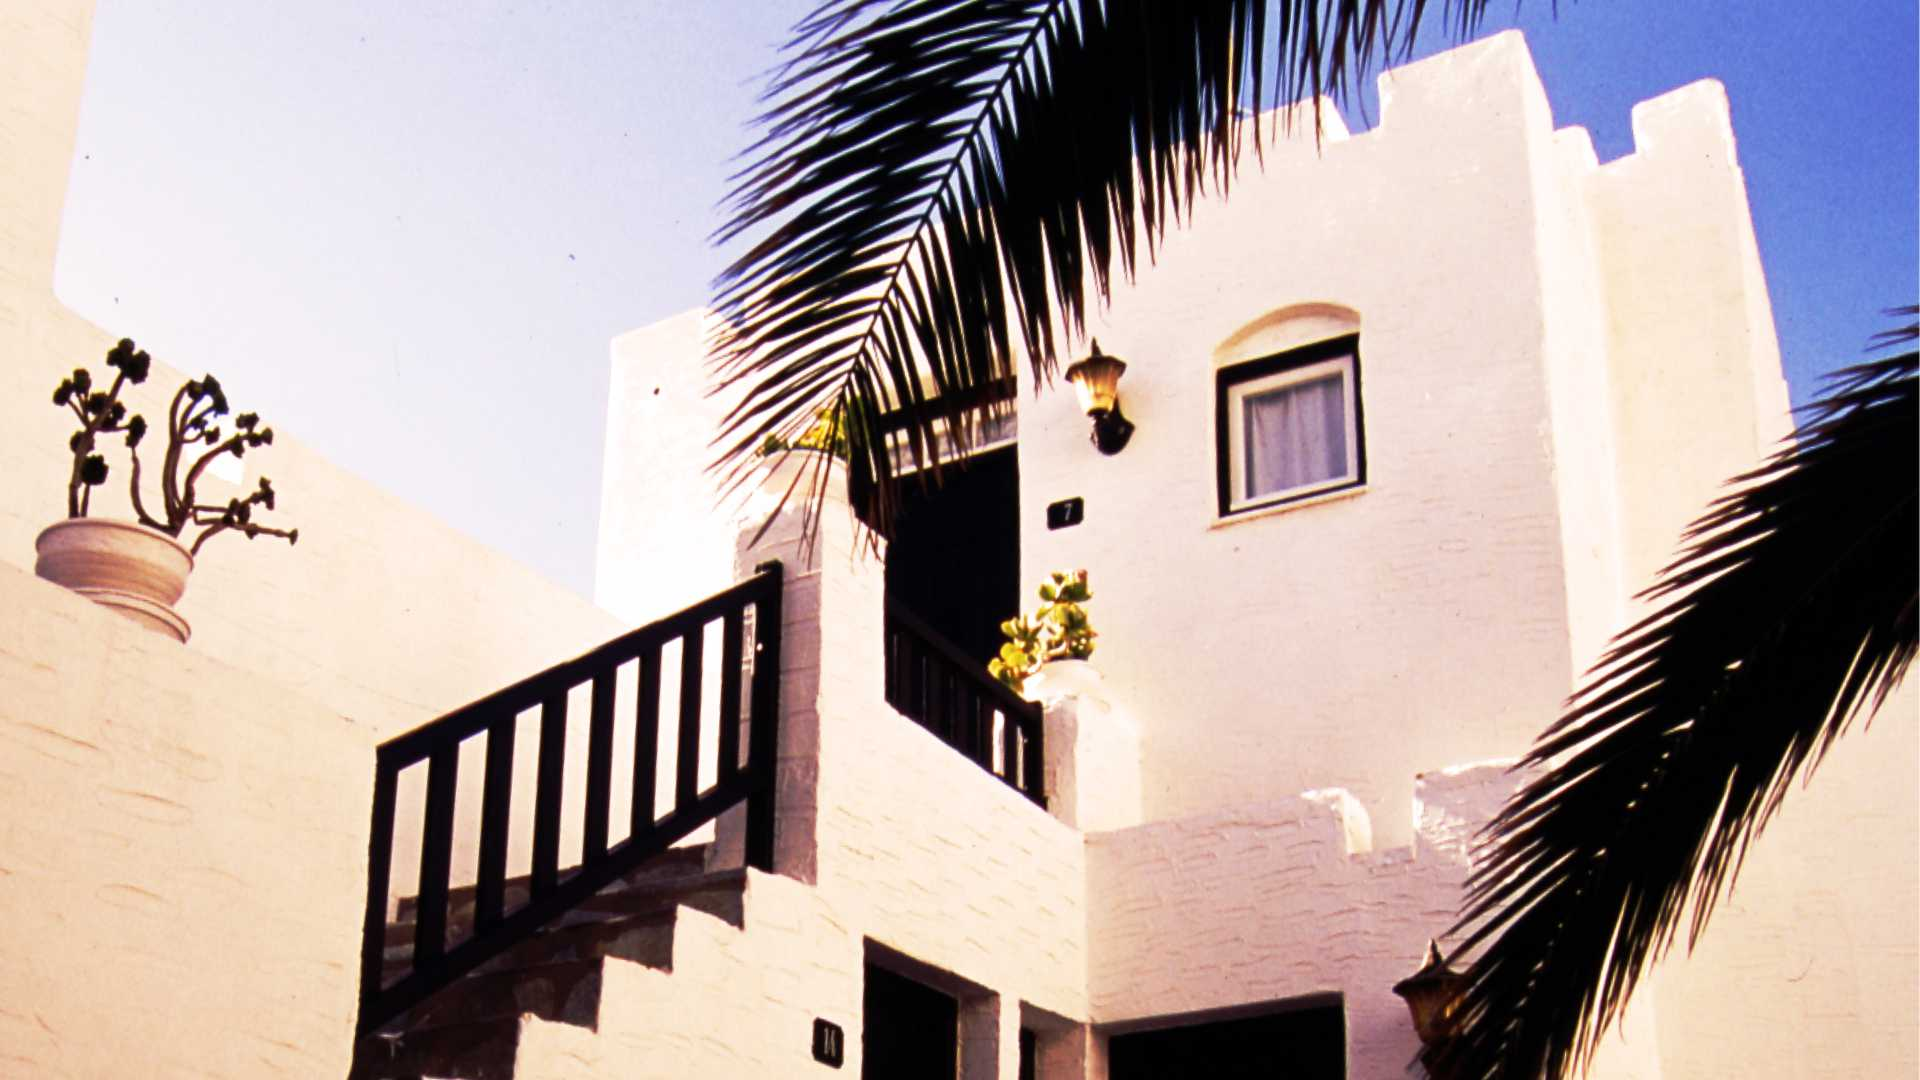 Antirides boutique hotel-paros island_Architecture_2